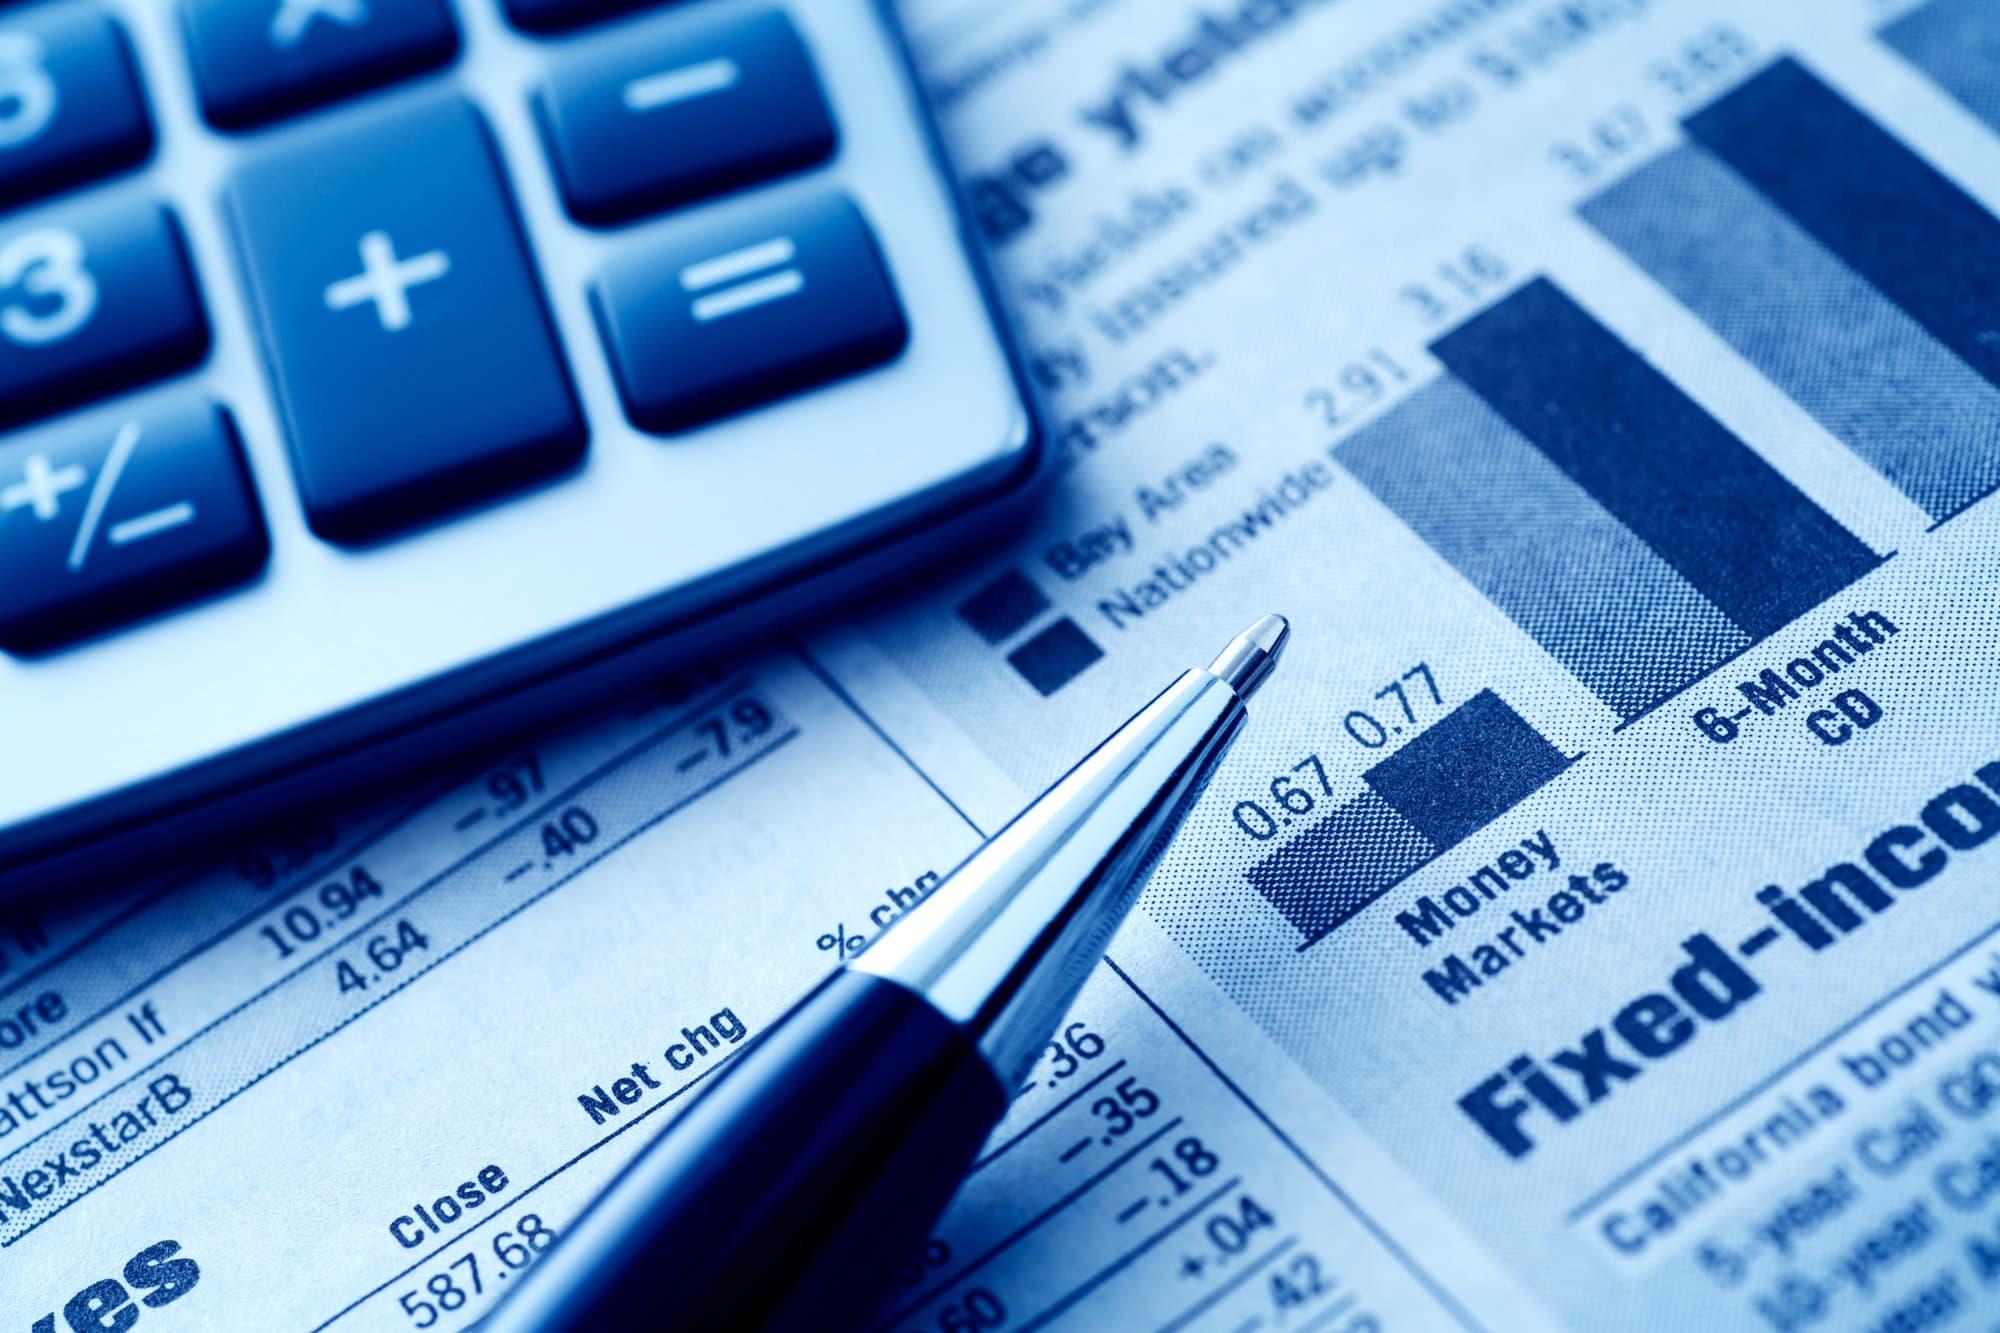 Self liquidating bond funds